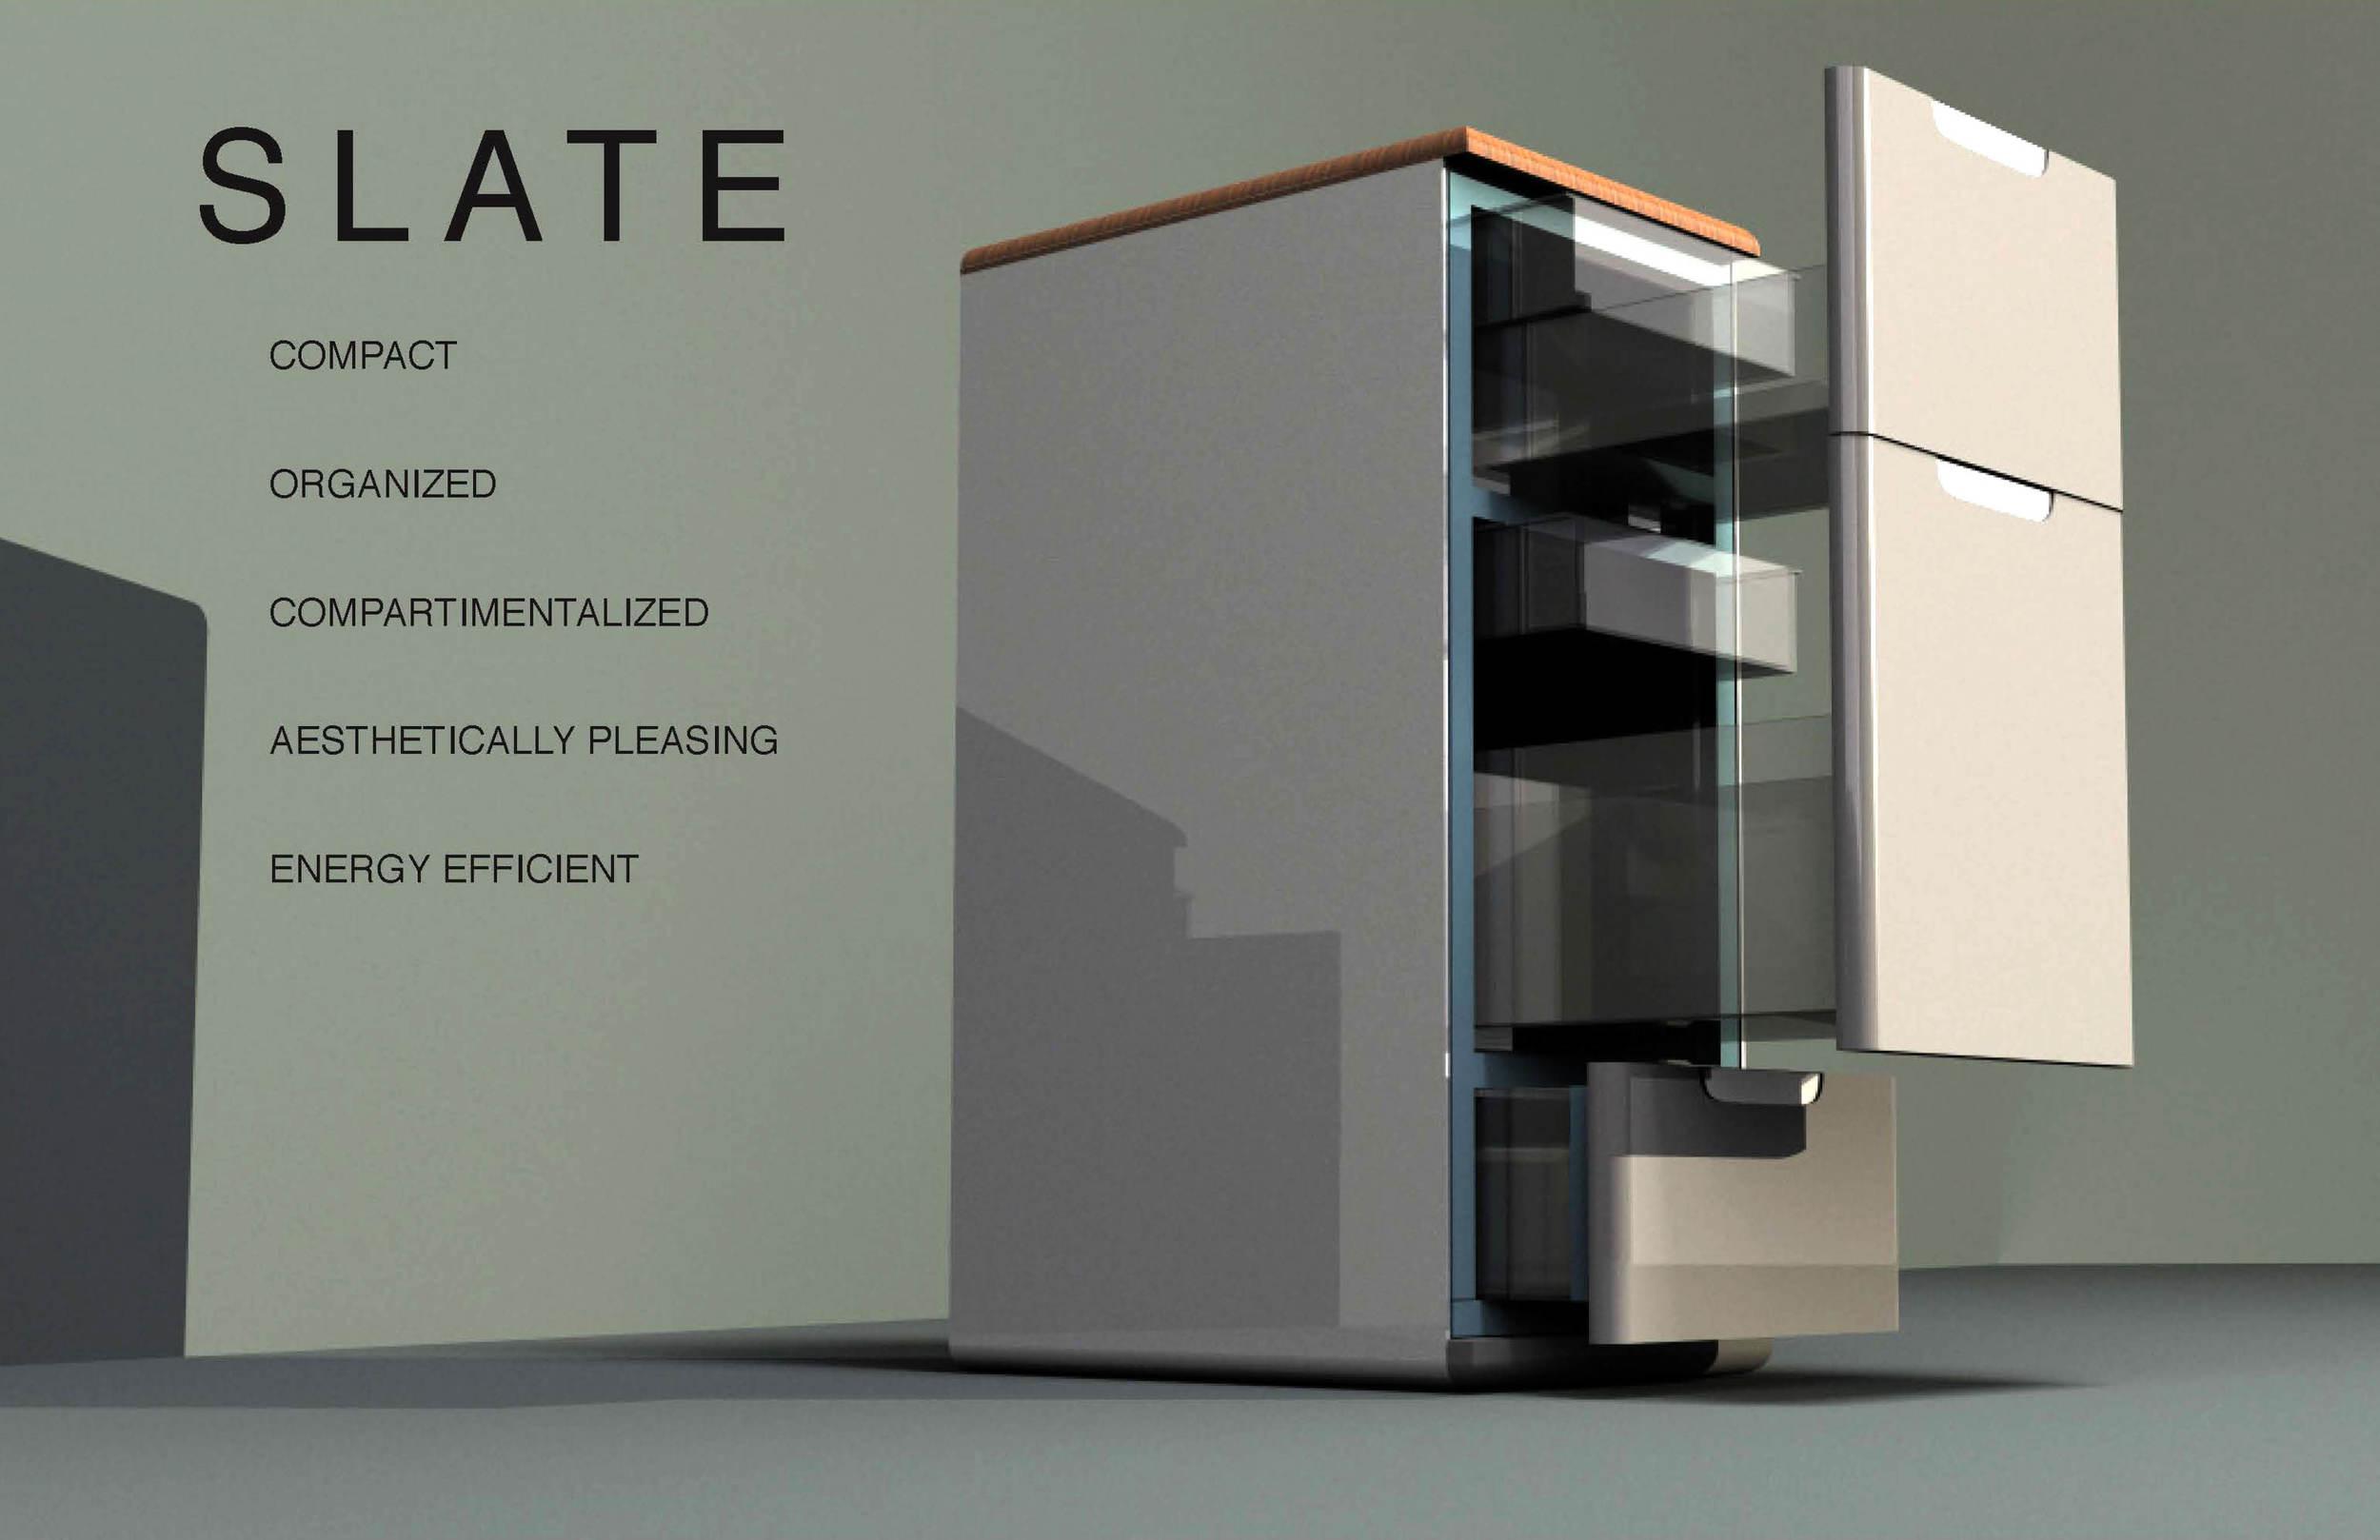 20-SLATE Compact Fridge-Final.jpg